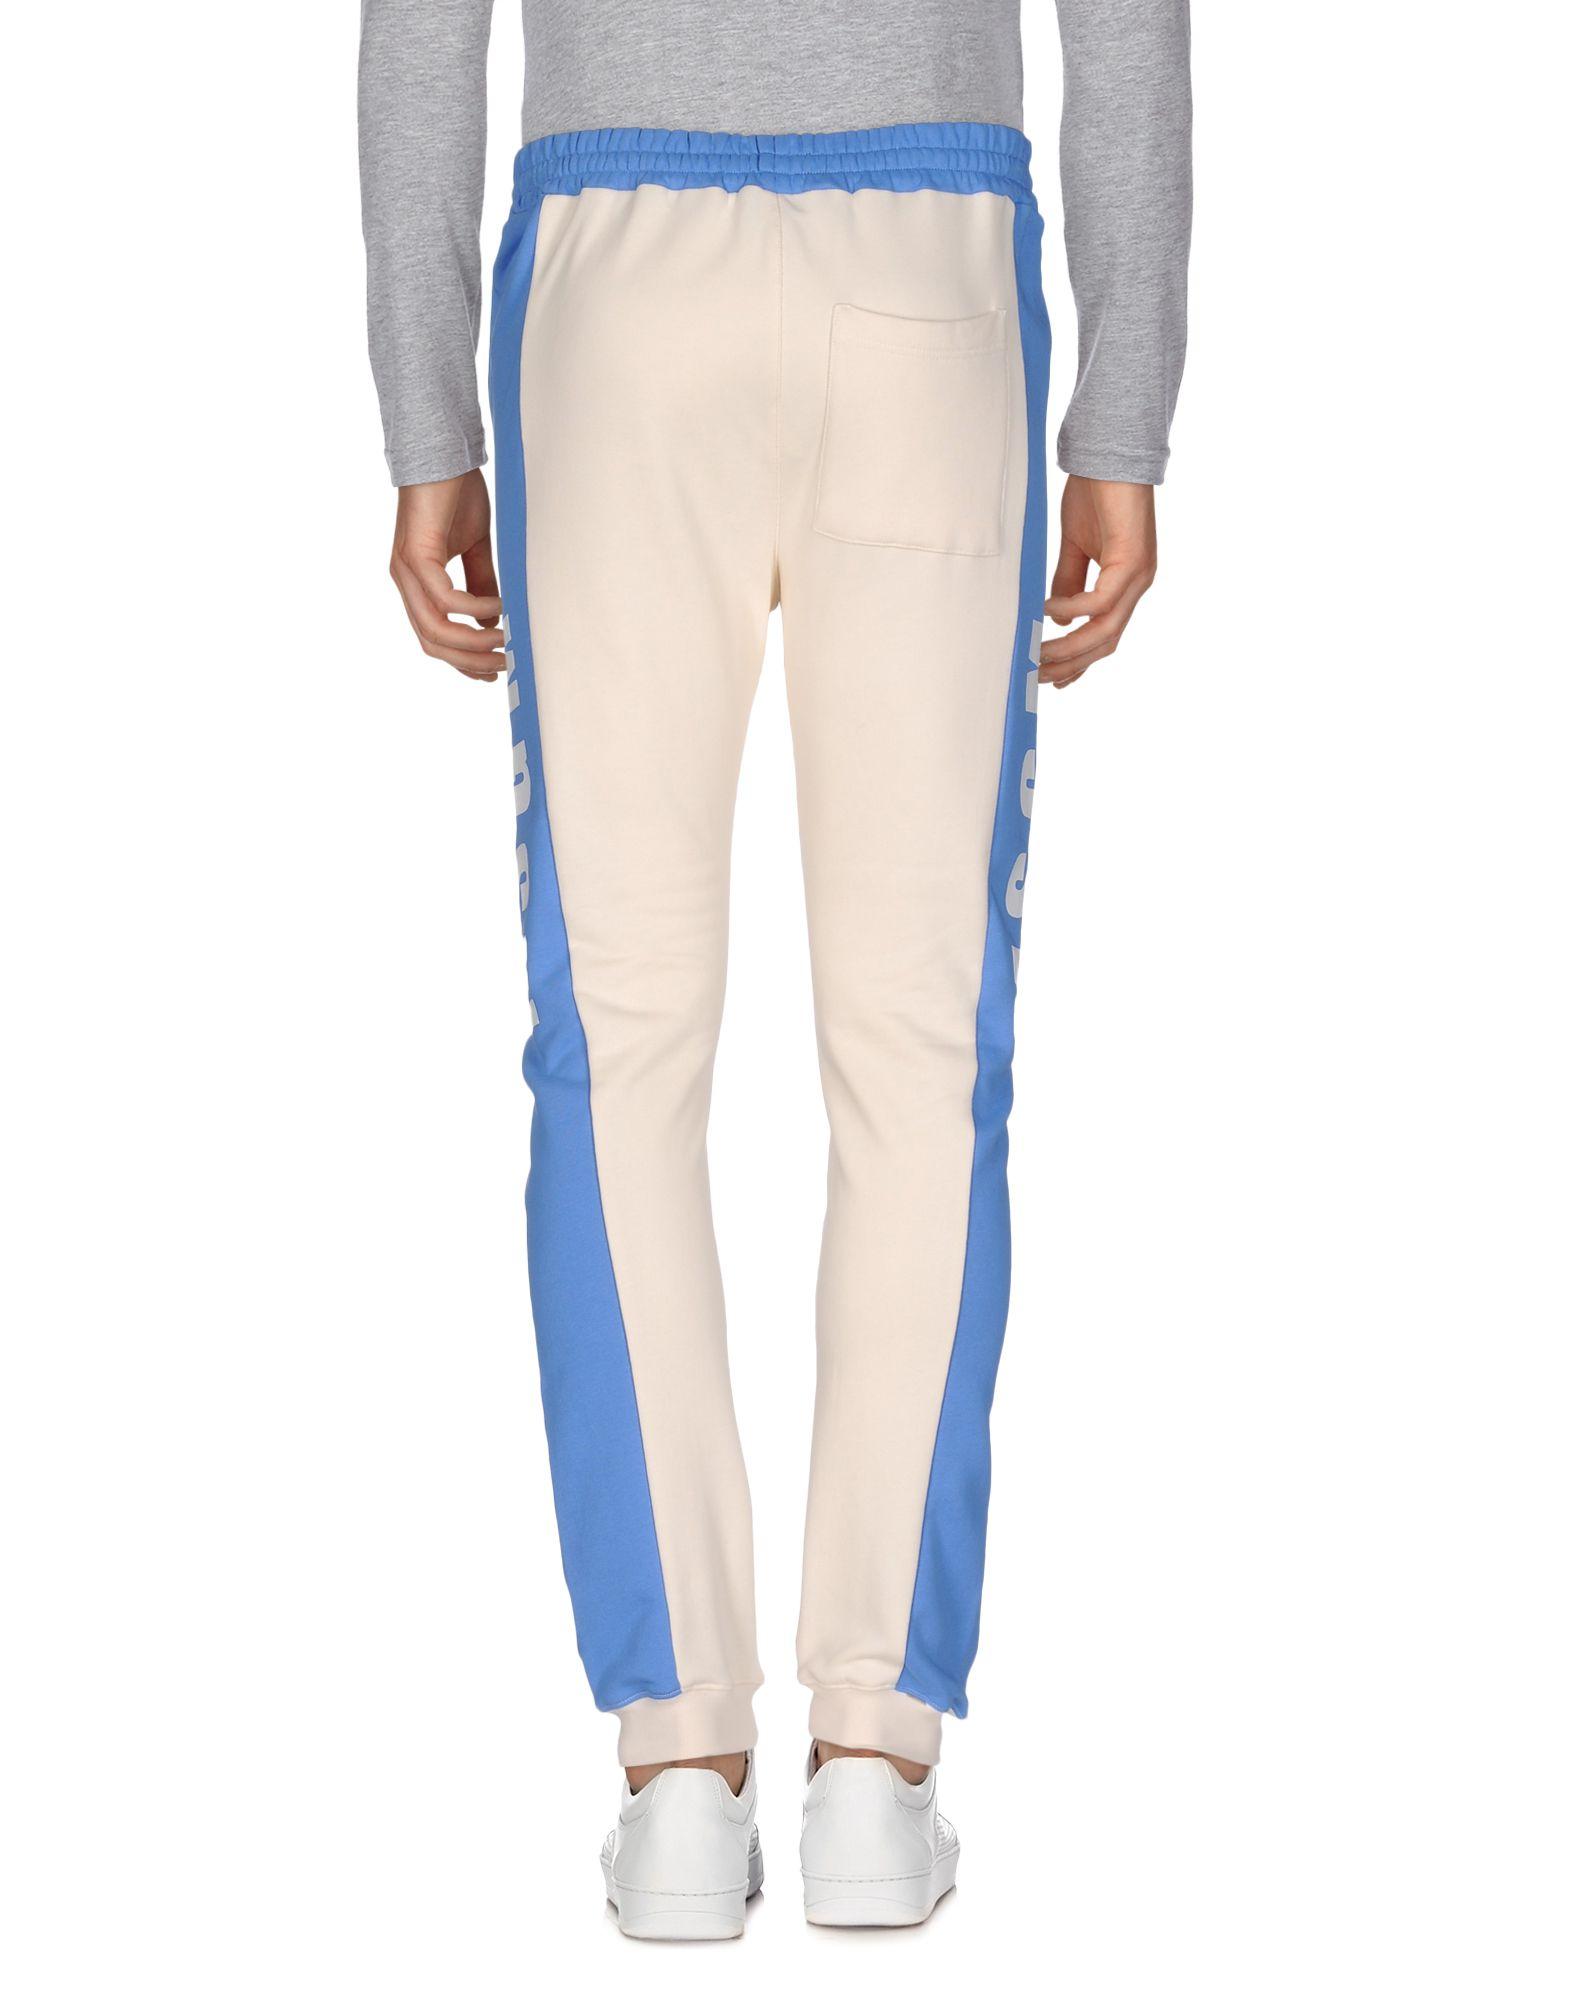 A A A buon mercato Pantalone Msgm Uomo - 13118570HS ec0f31